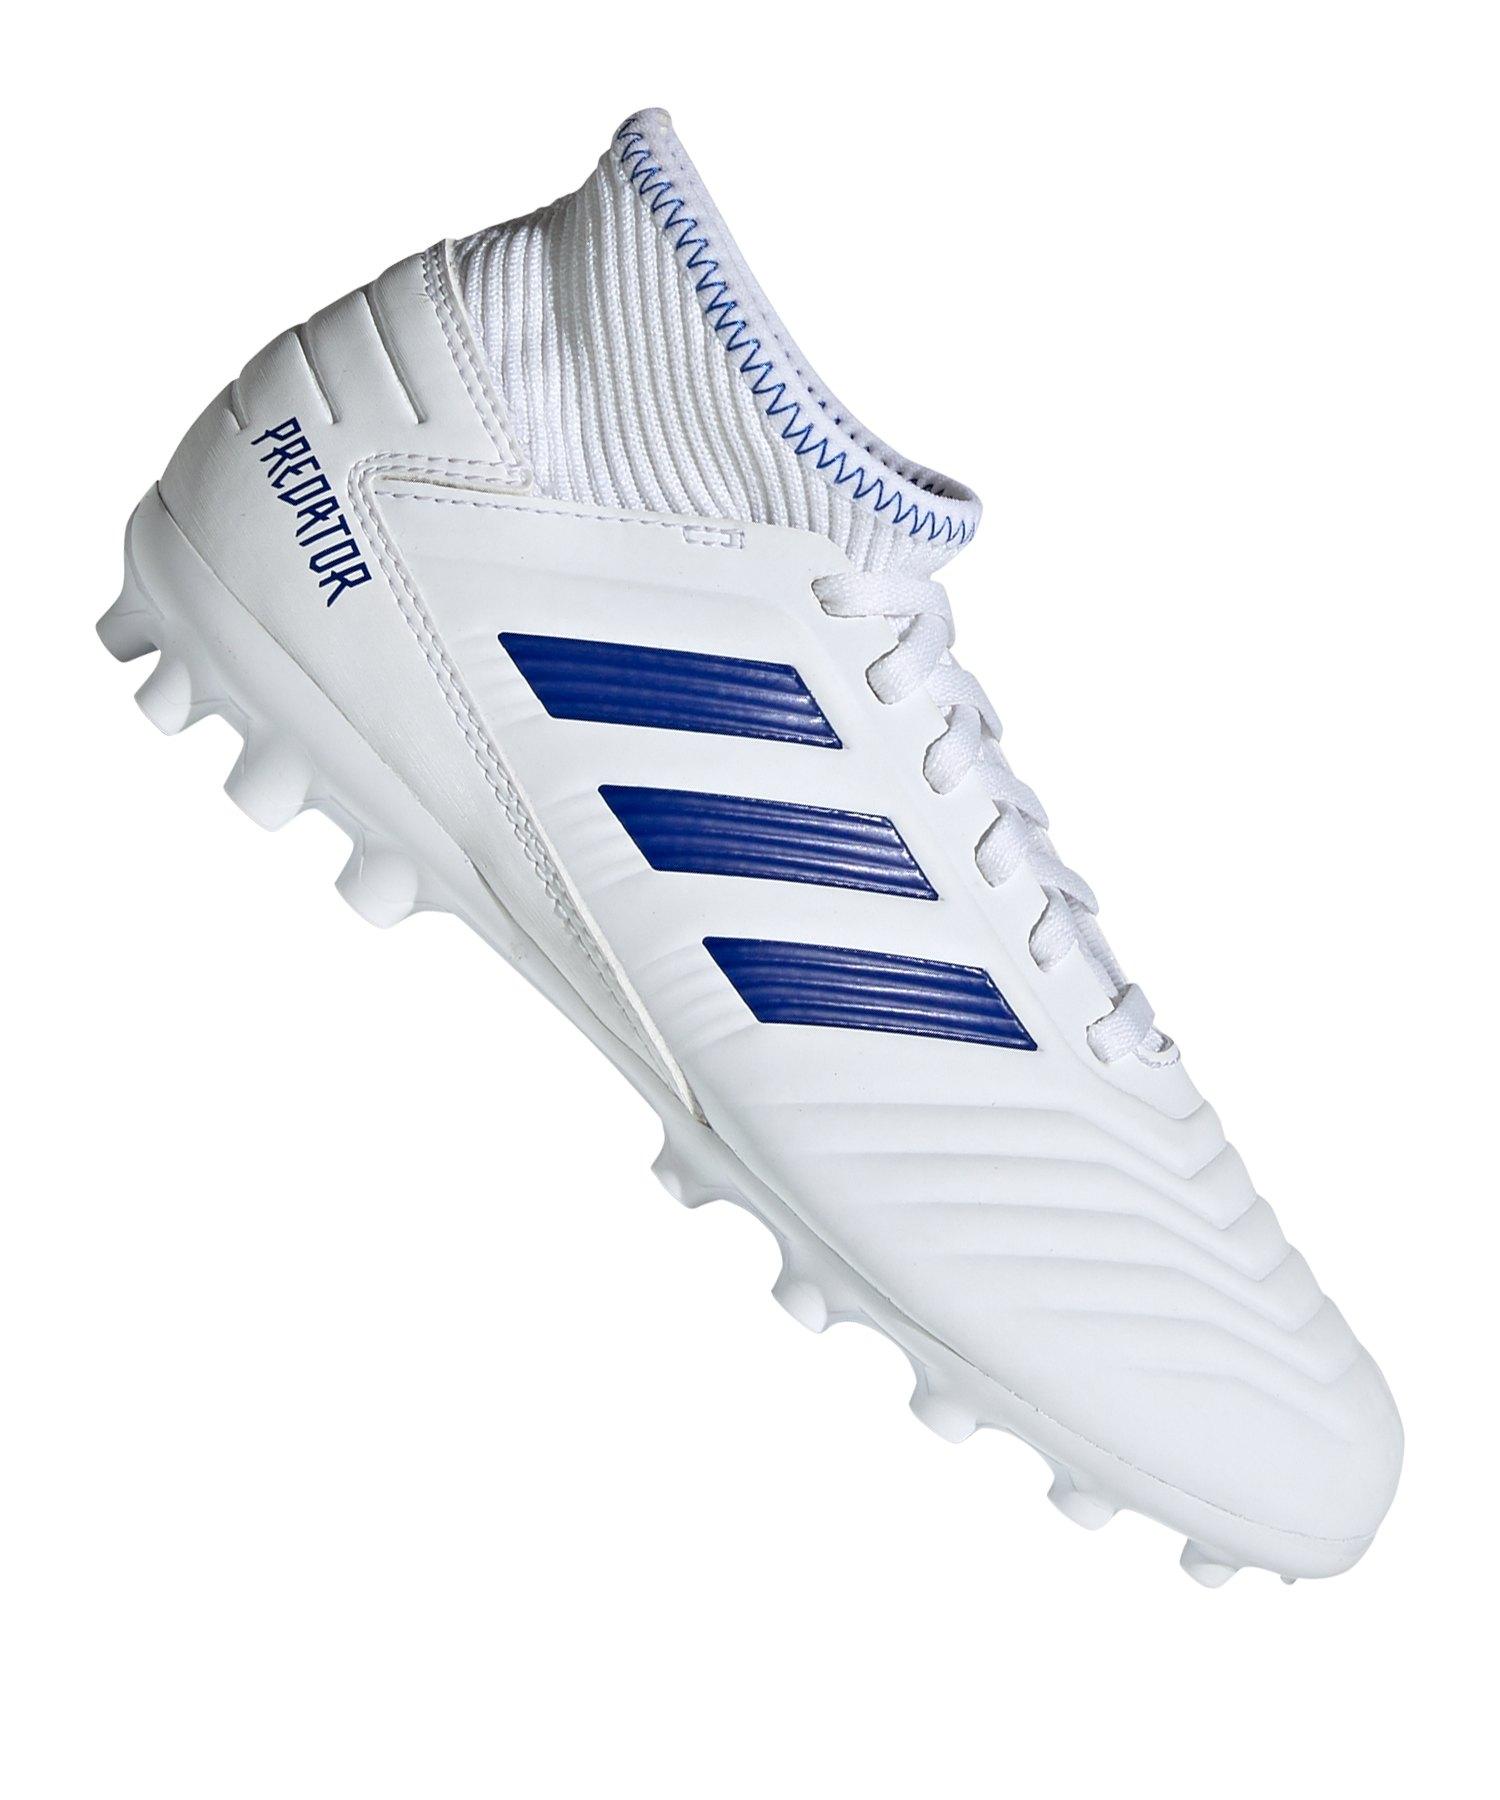 adidas Predator 19.3 AG J Kids Weiss Blau - weiss